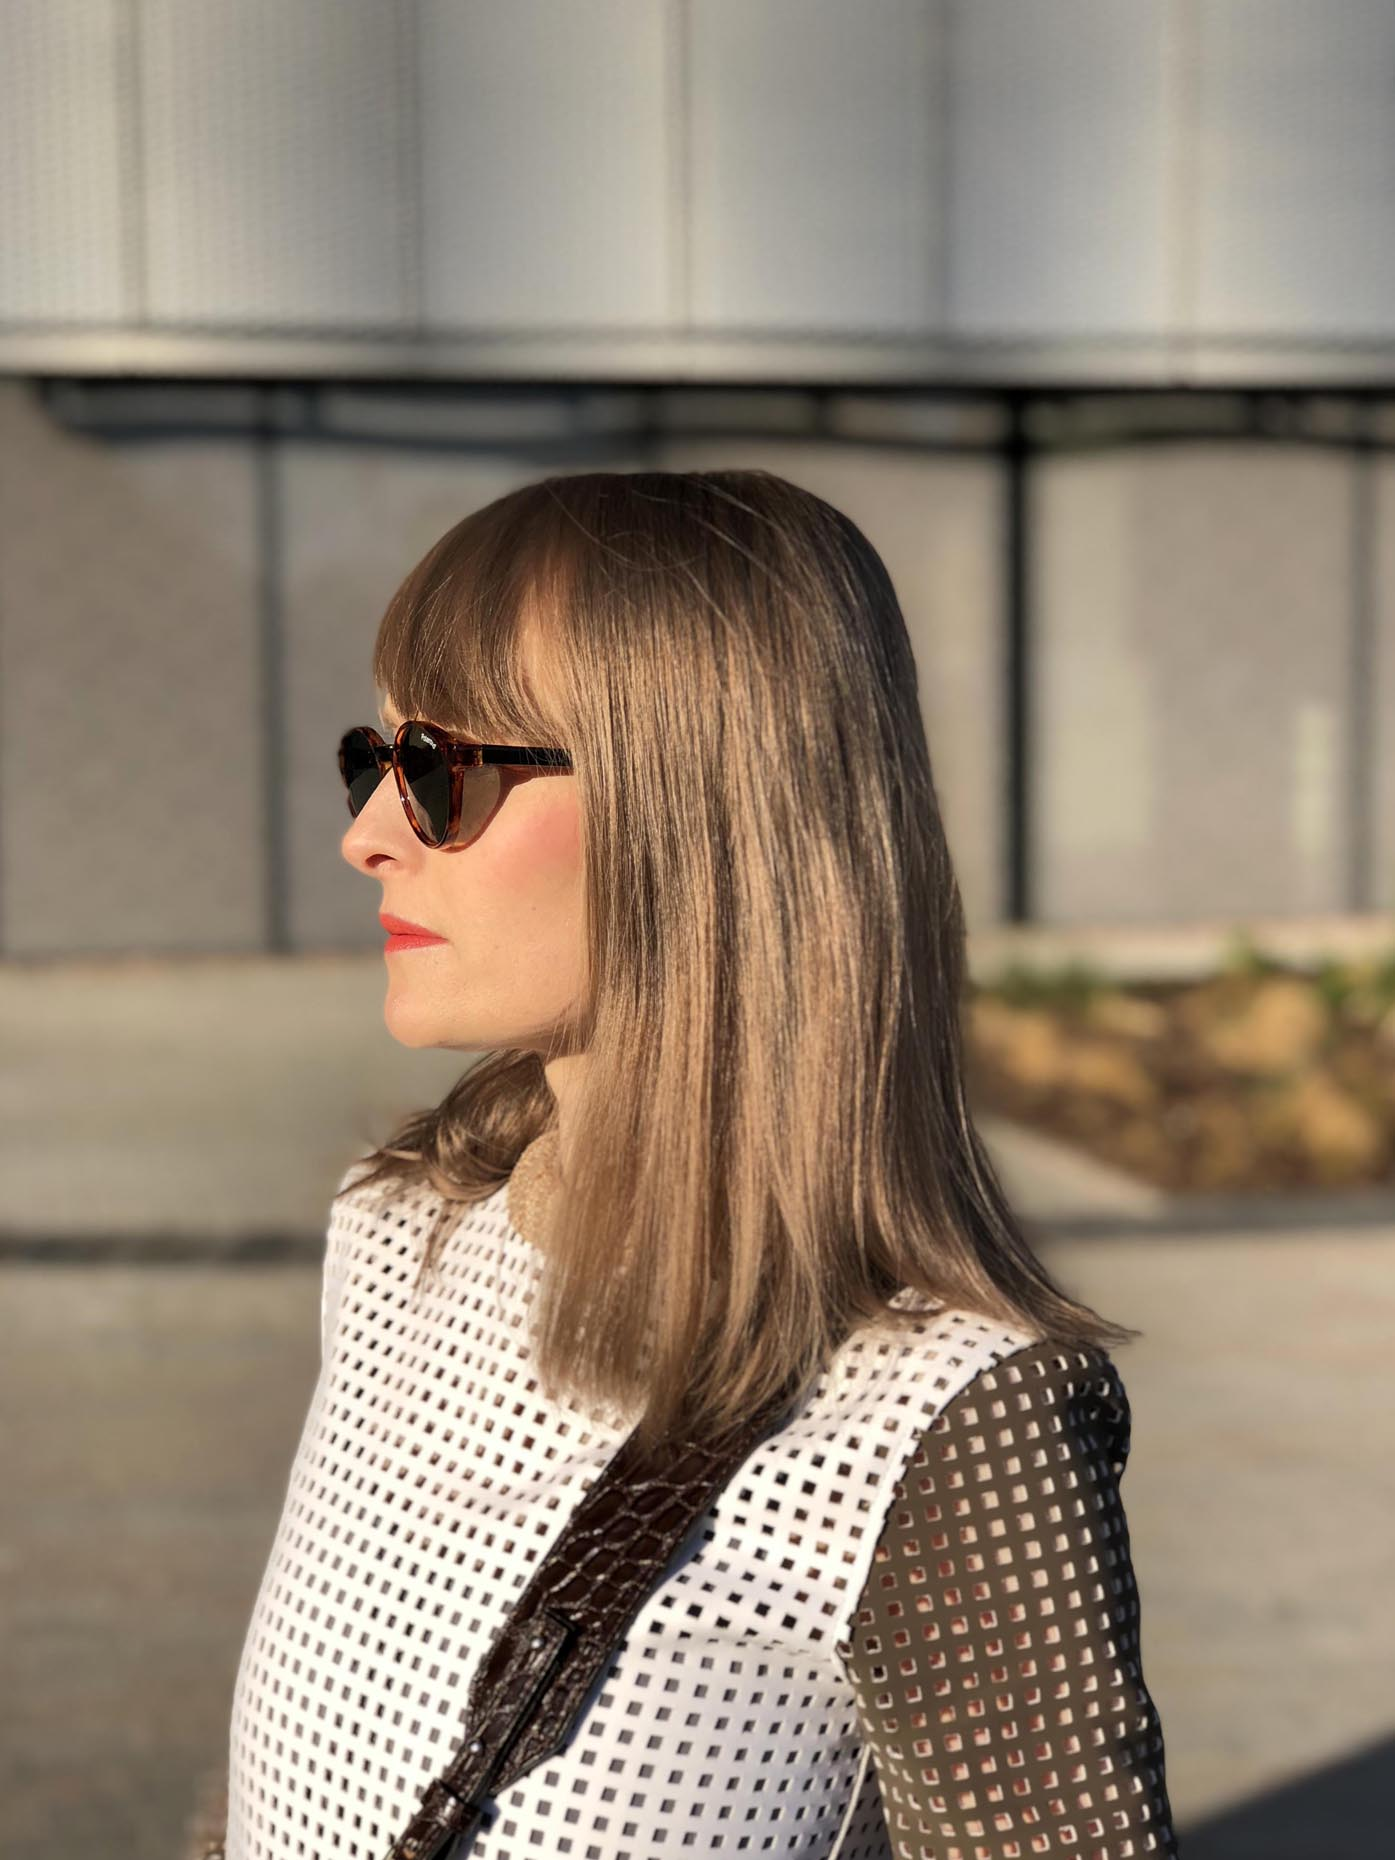 polaroid sunglasses, jw anderson top, saddle bag zofia chylak by fashion art media